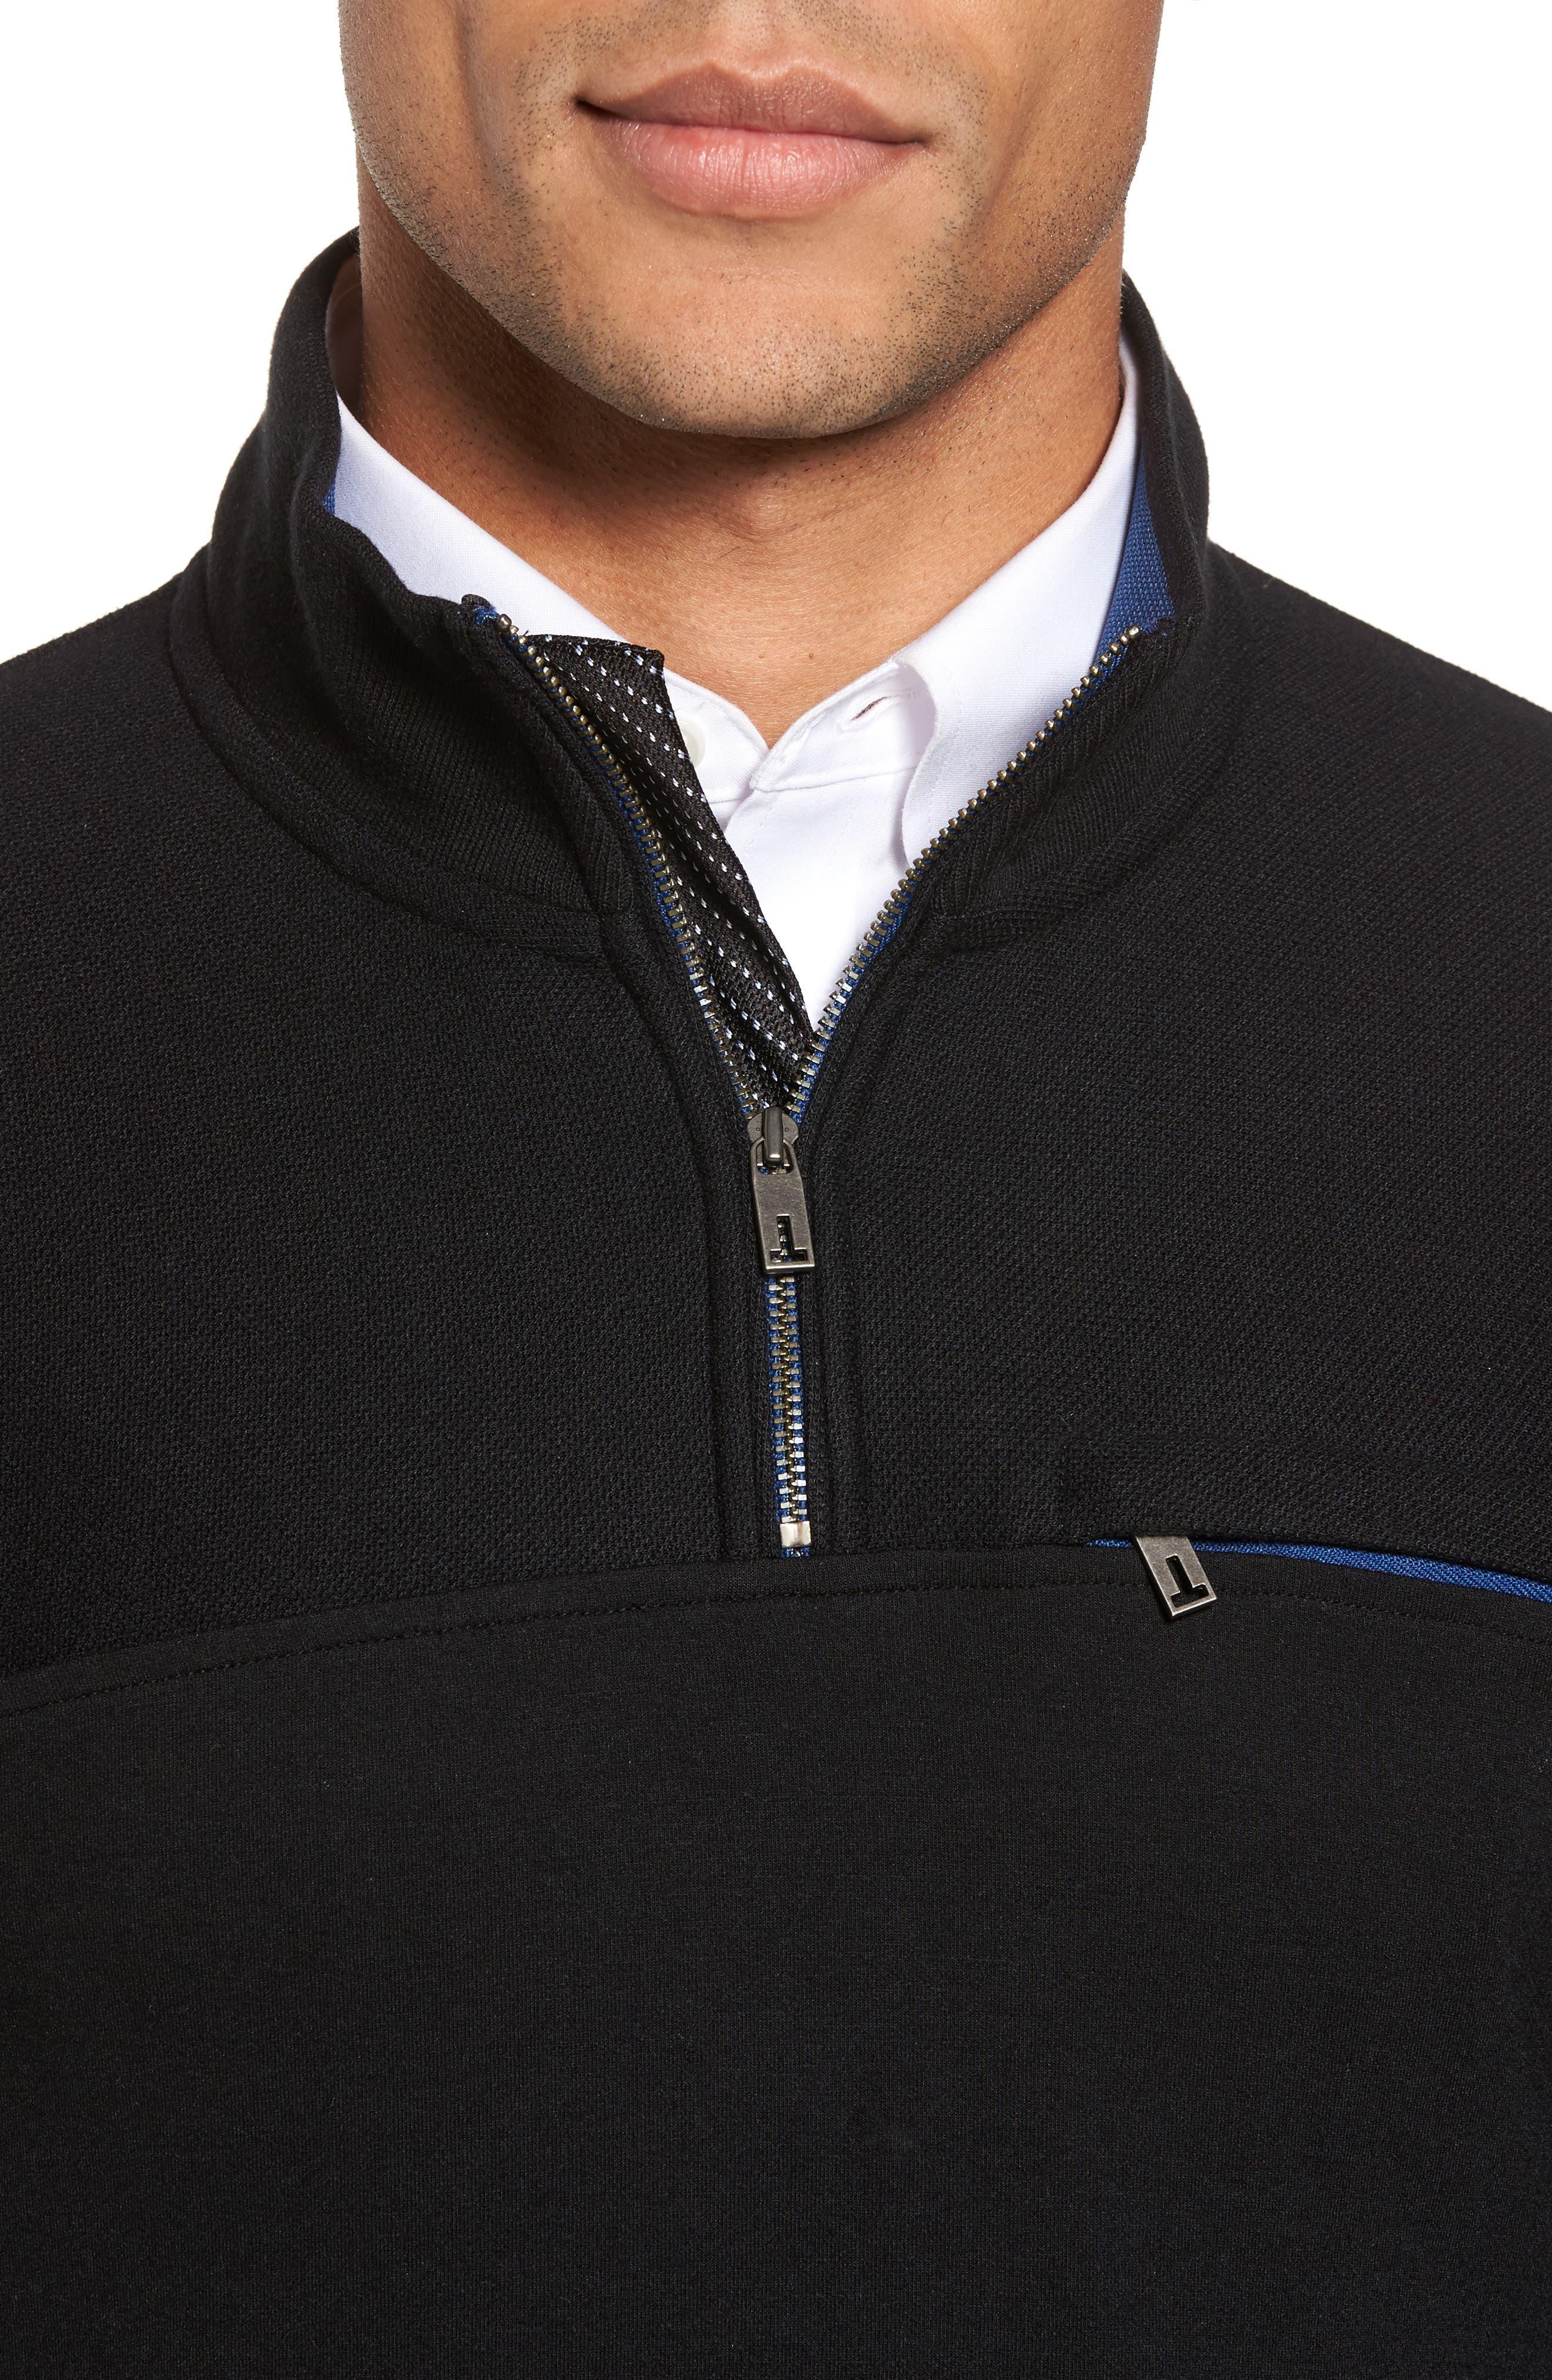 Livstay Slim Fit Quarter Zip Pullover,                             Alternate thumbnail 4, color,                             001